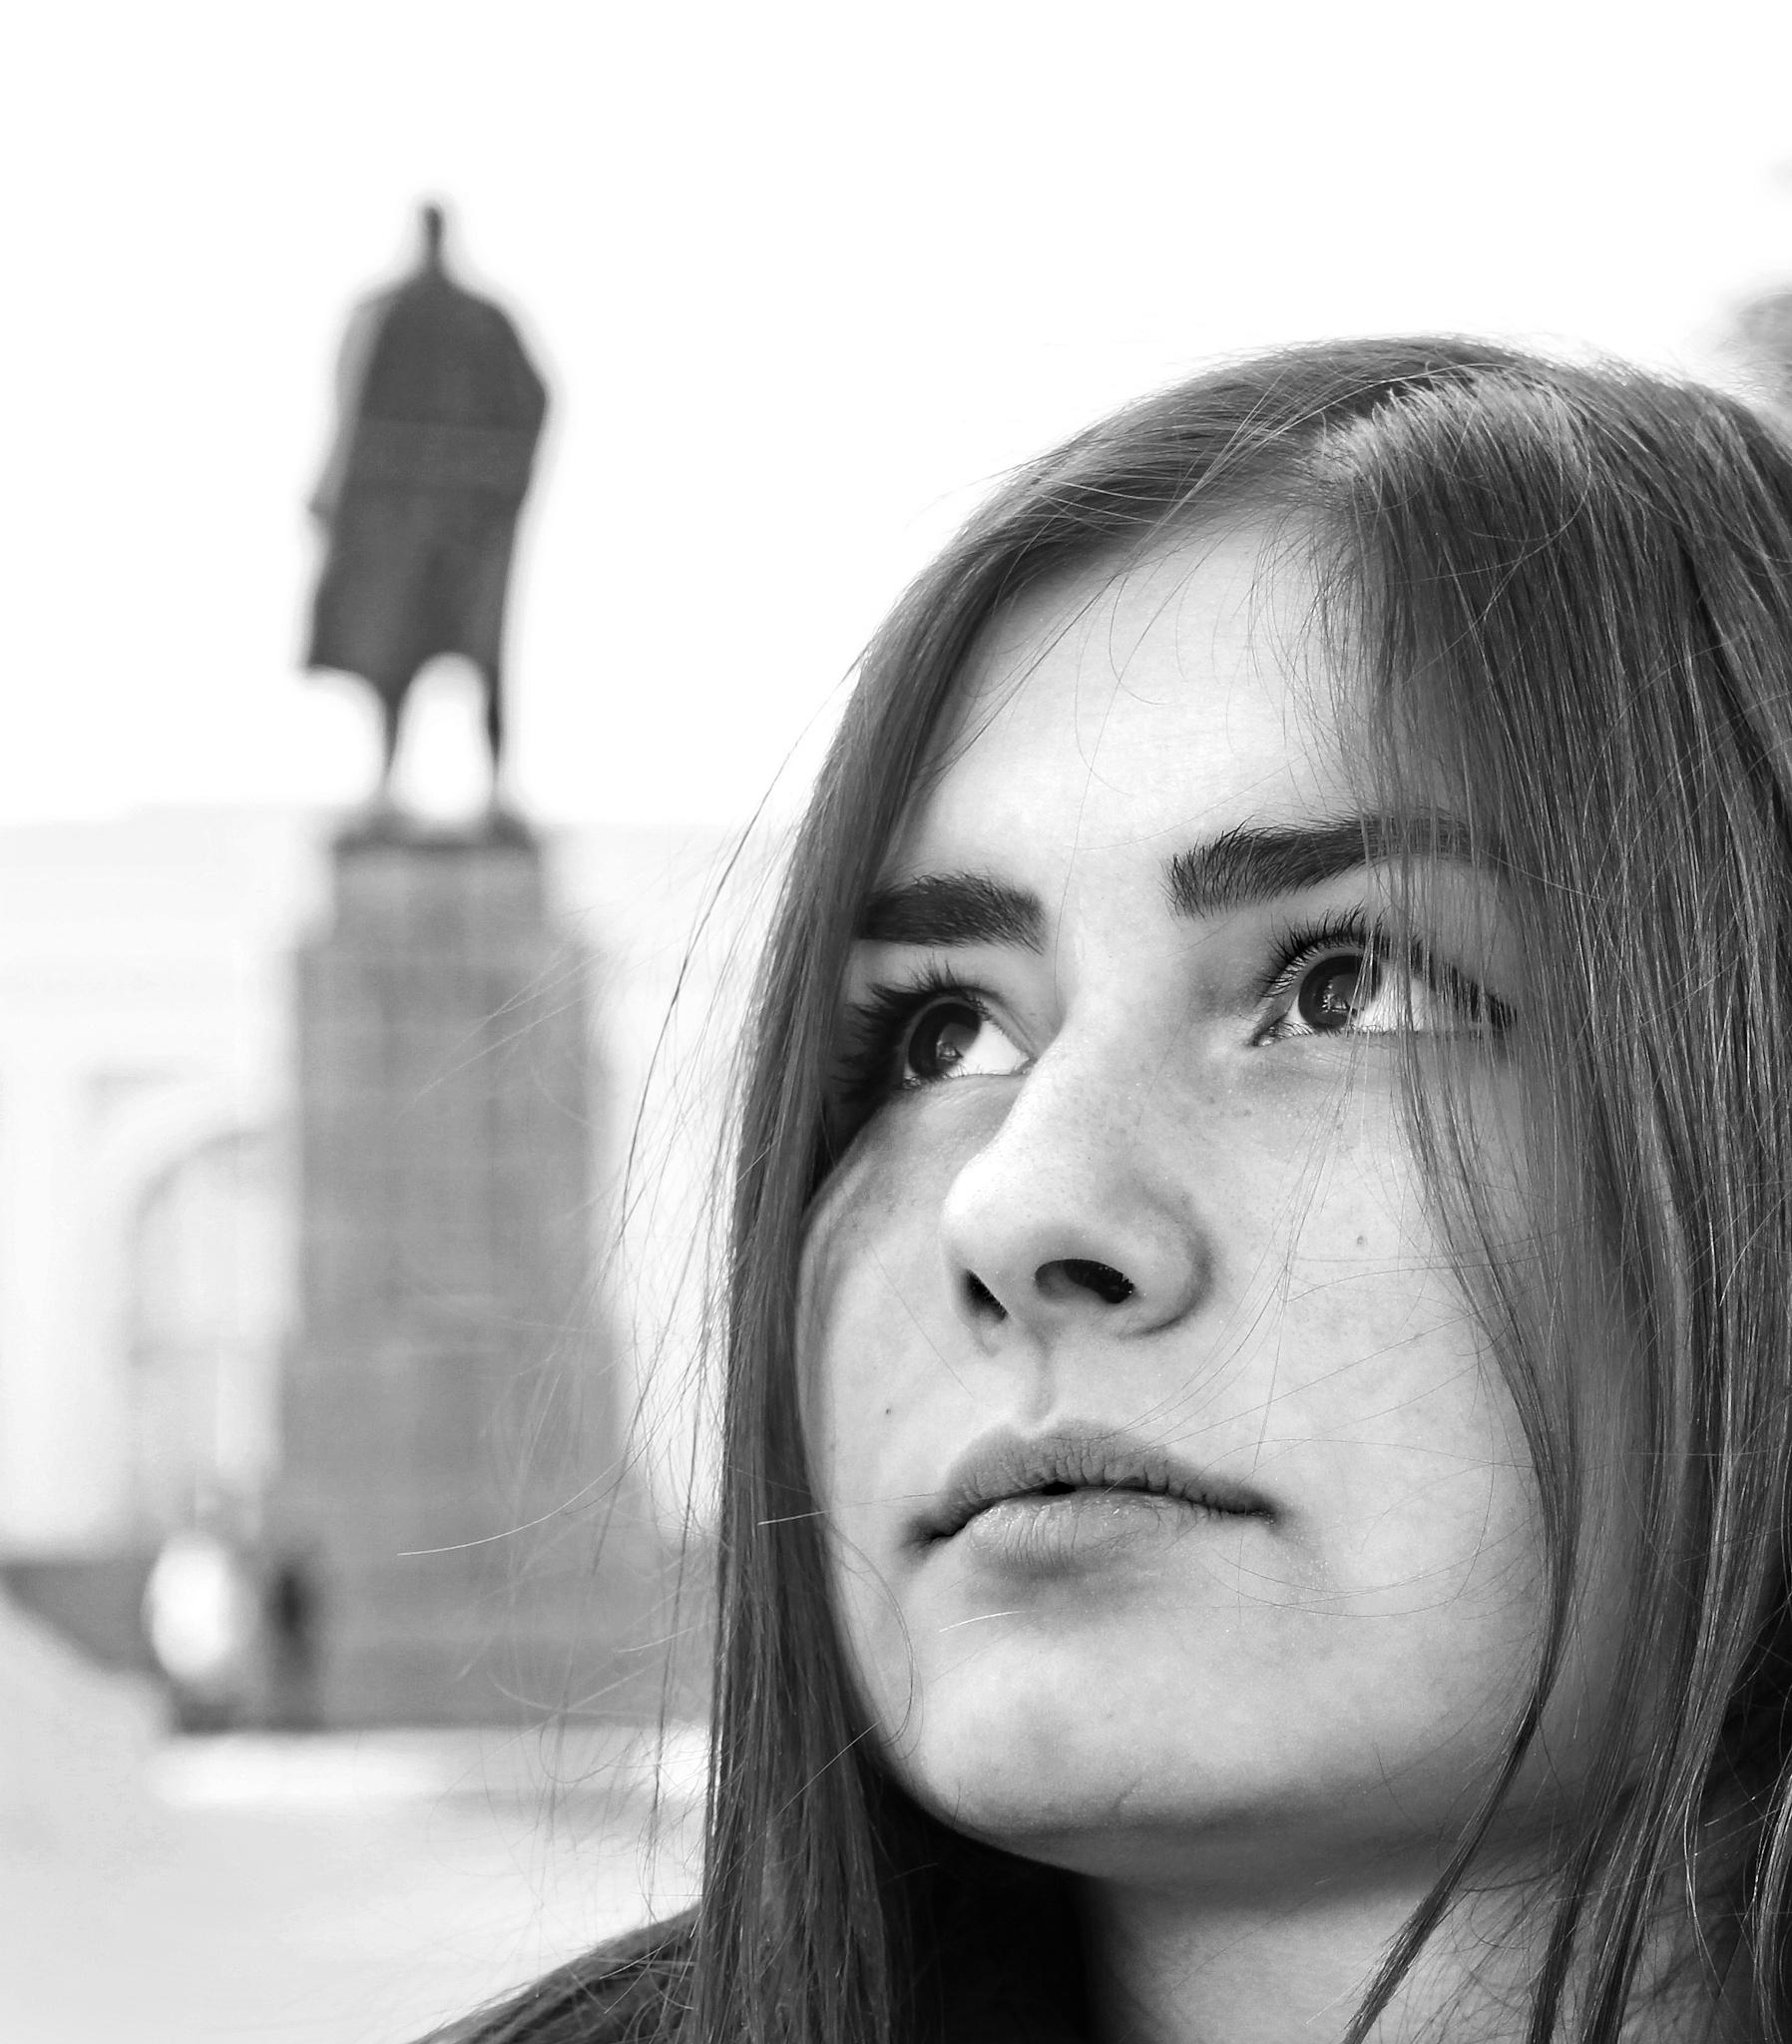 Lenin  and Yuliya  by Сергей Юрьев